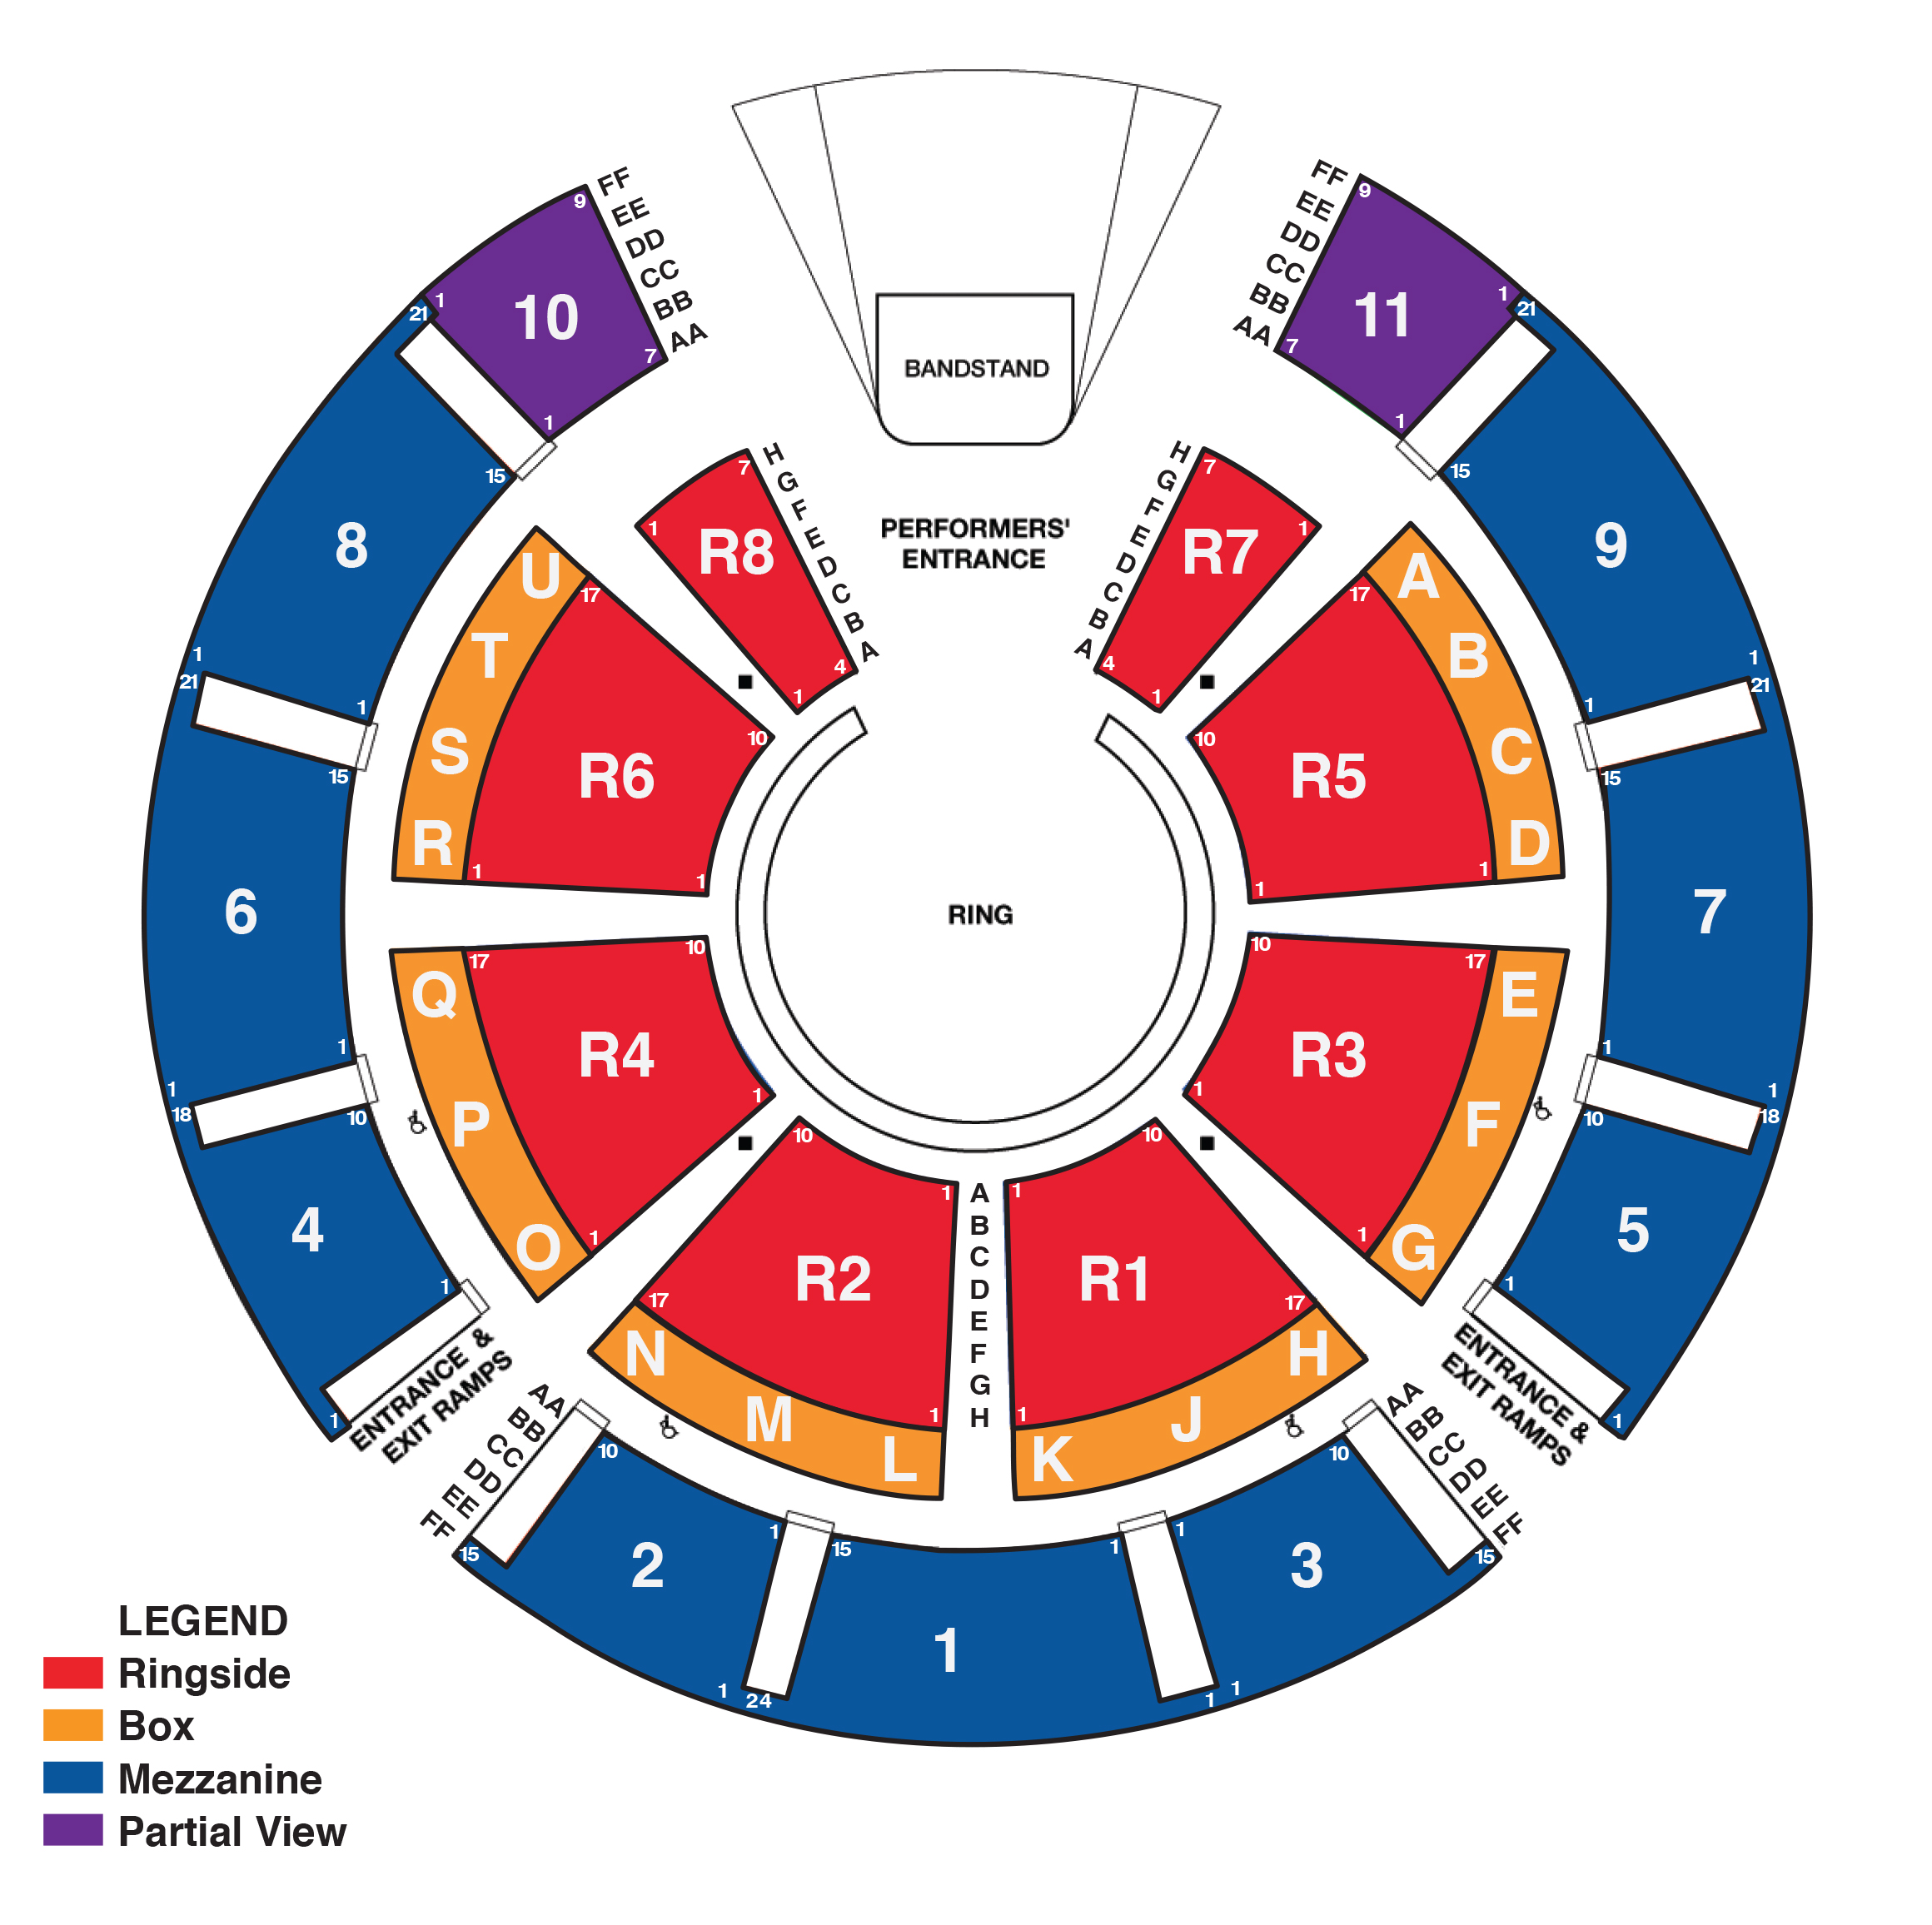 Verizon wireless amphitheatre concert seating chart gwen stefani united we rock big apple circus also alpharetta ga tickets schedule rh goldstar